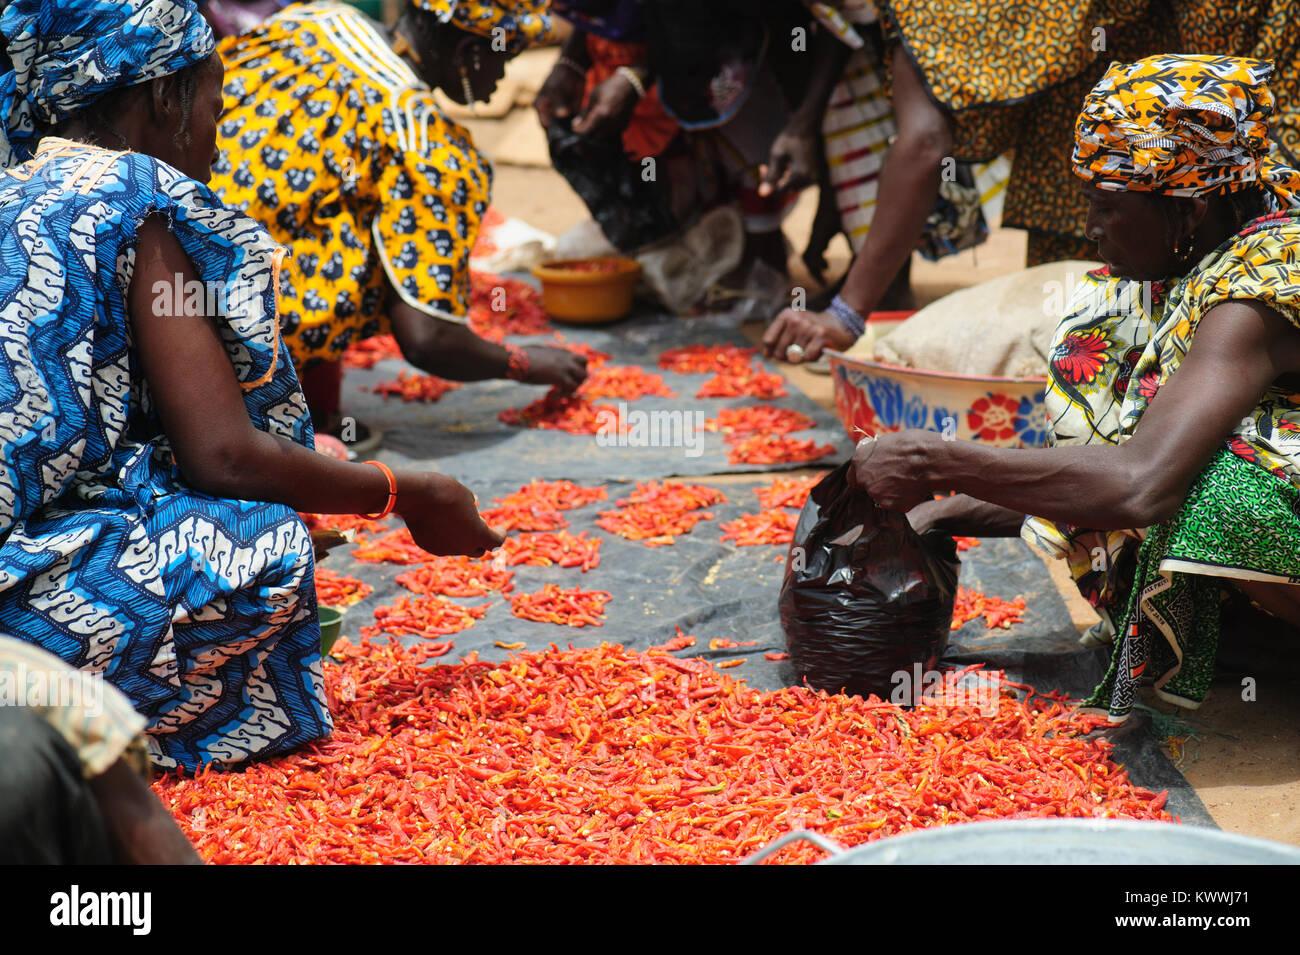 Mali Africa Black African People Gathering And Preparing Chili Stock Photo Alamy